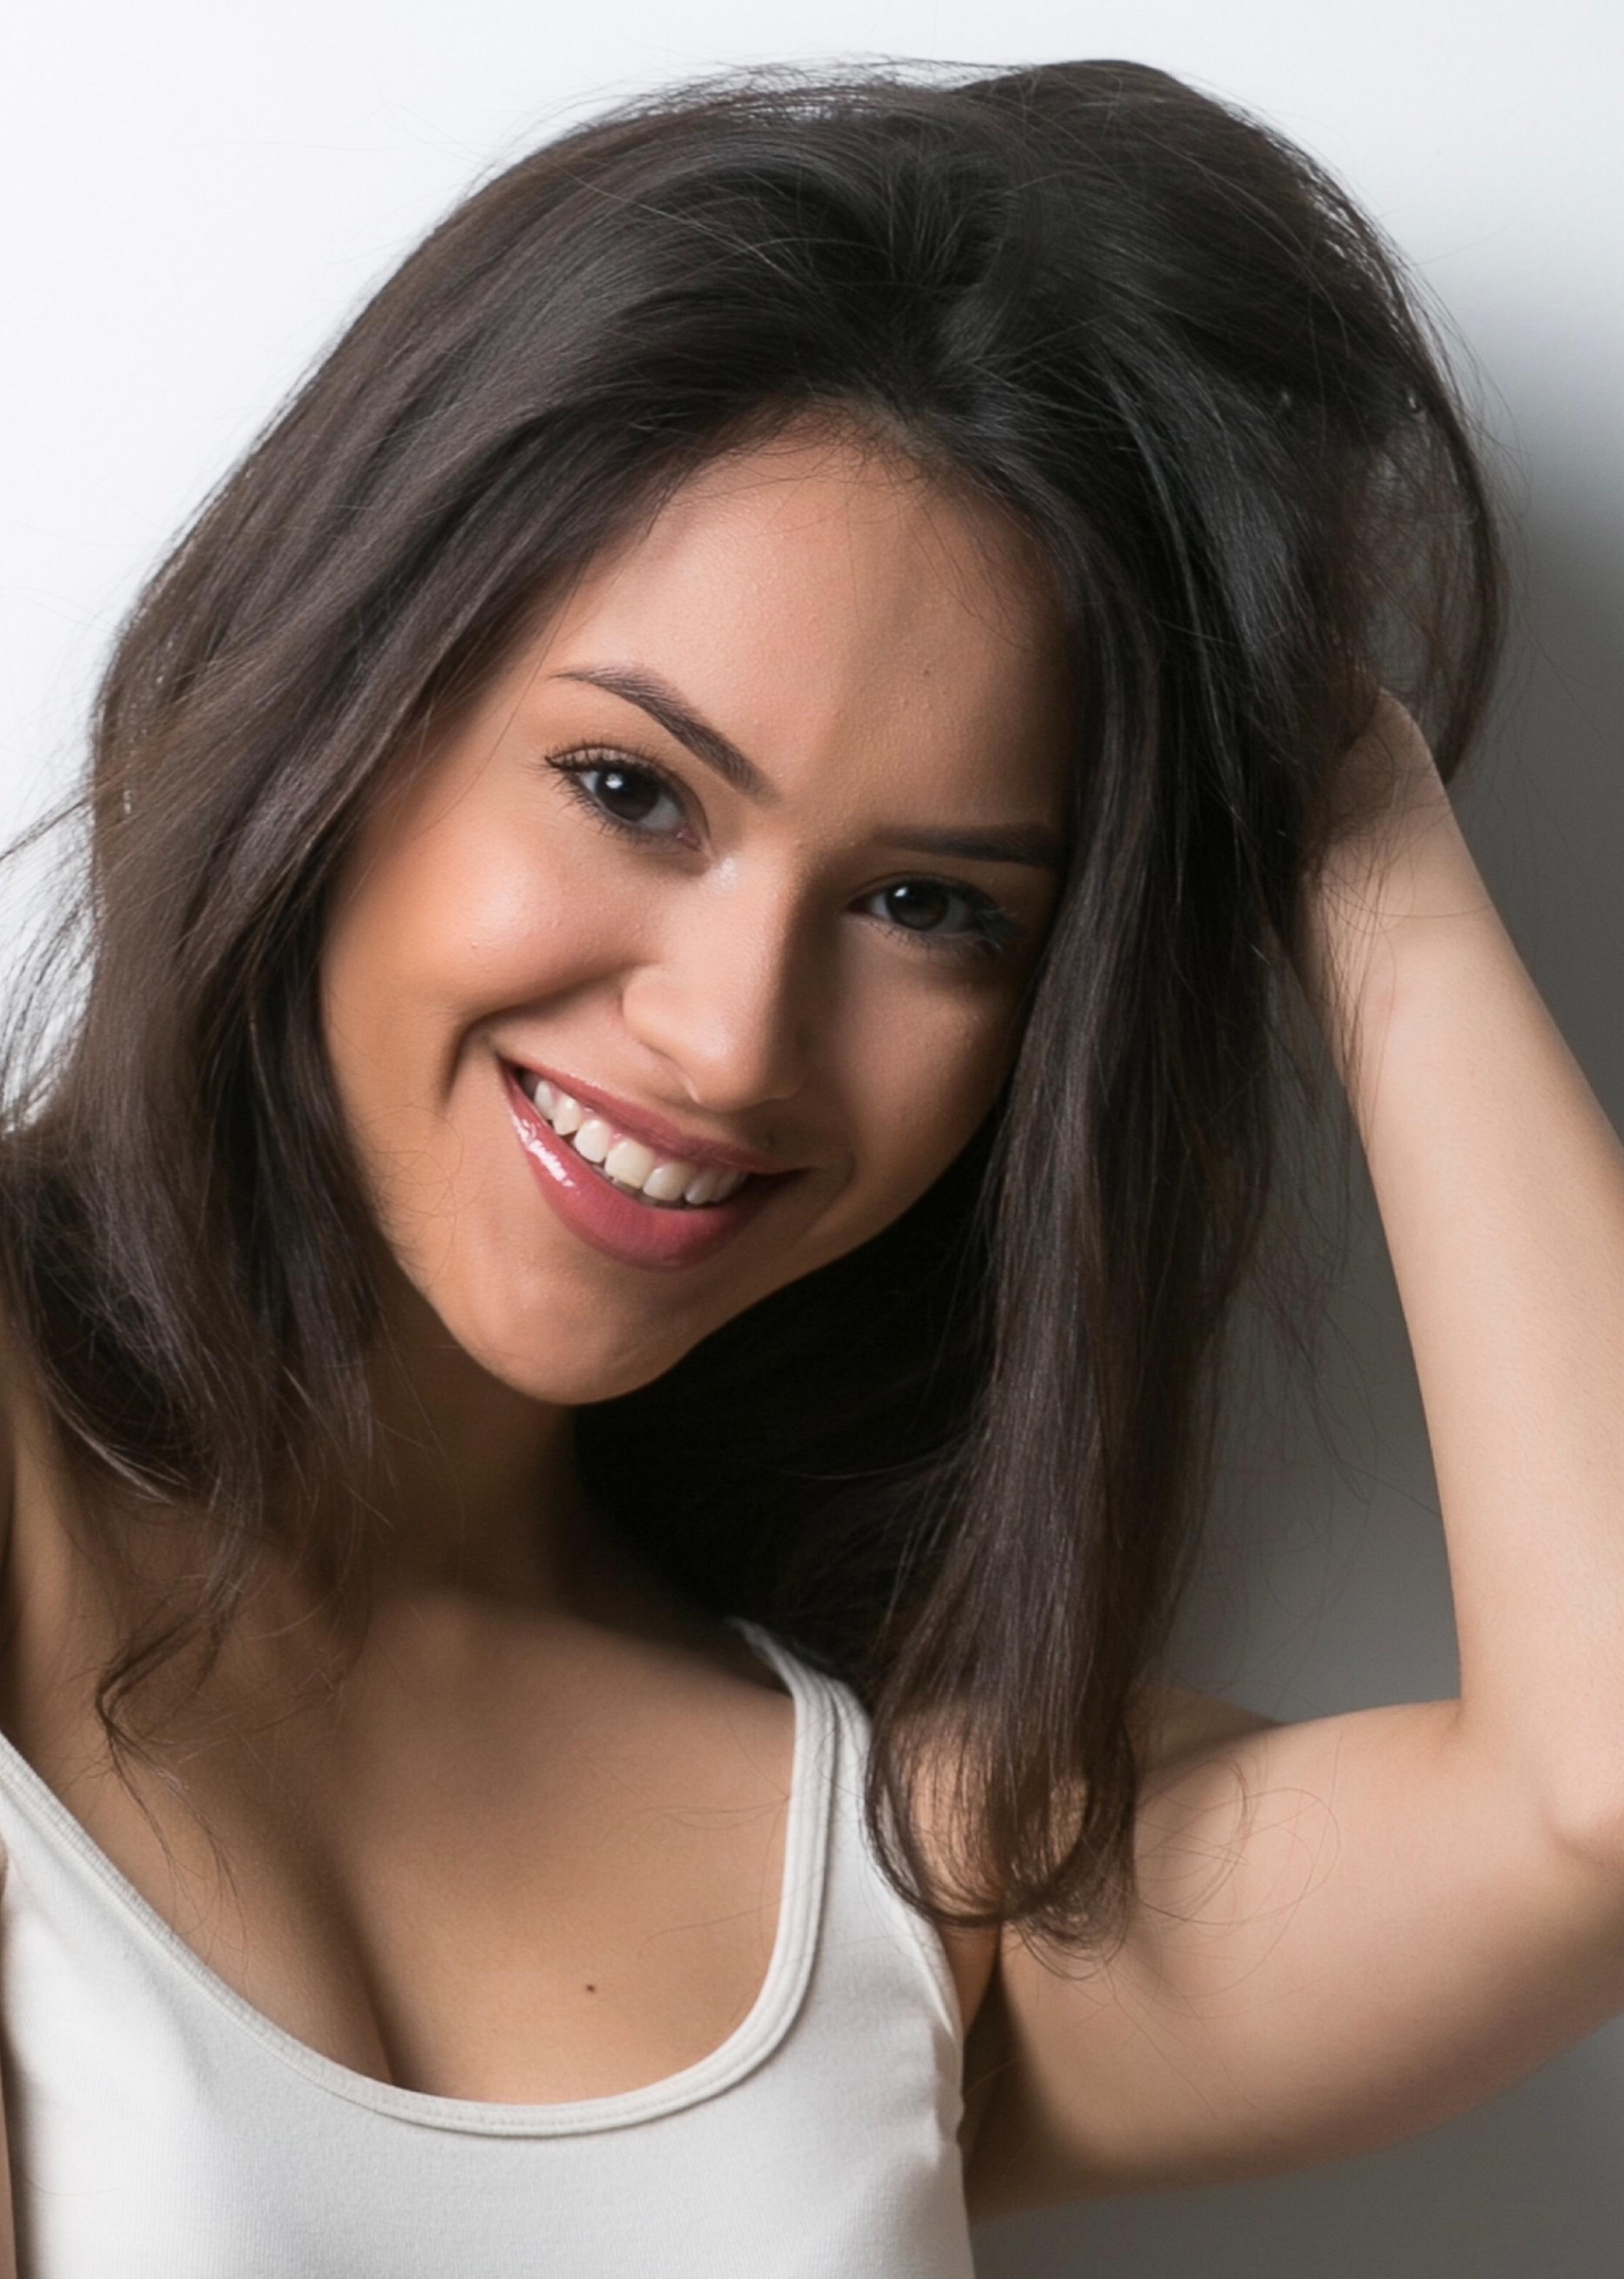 Victoria Kamila